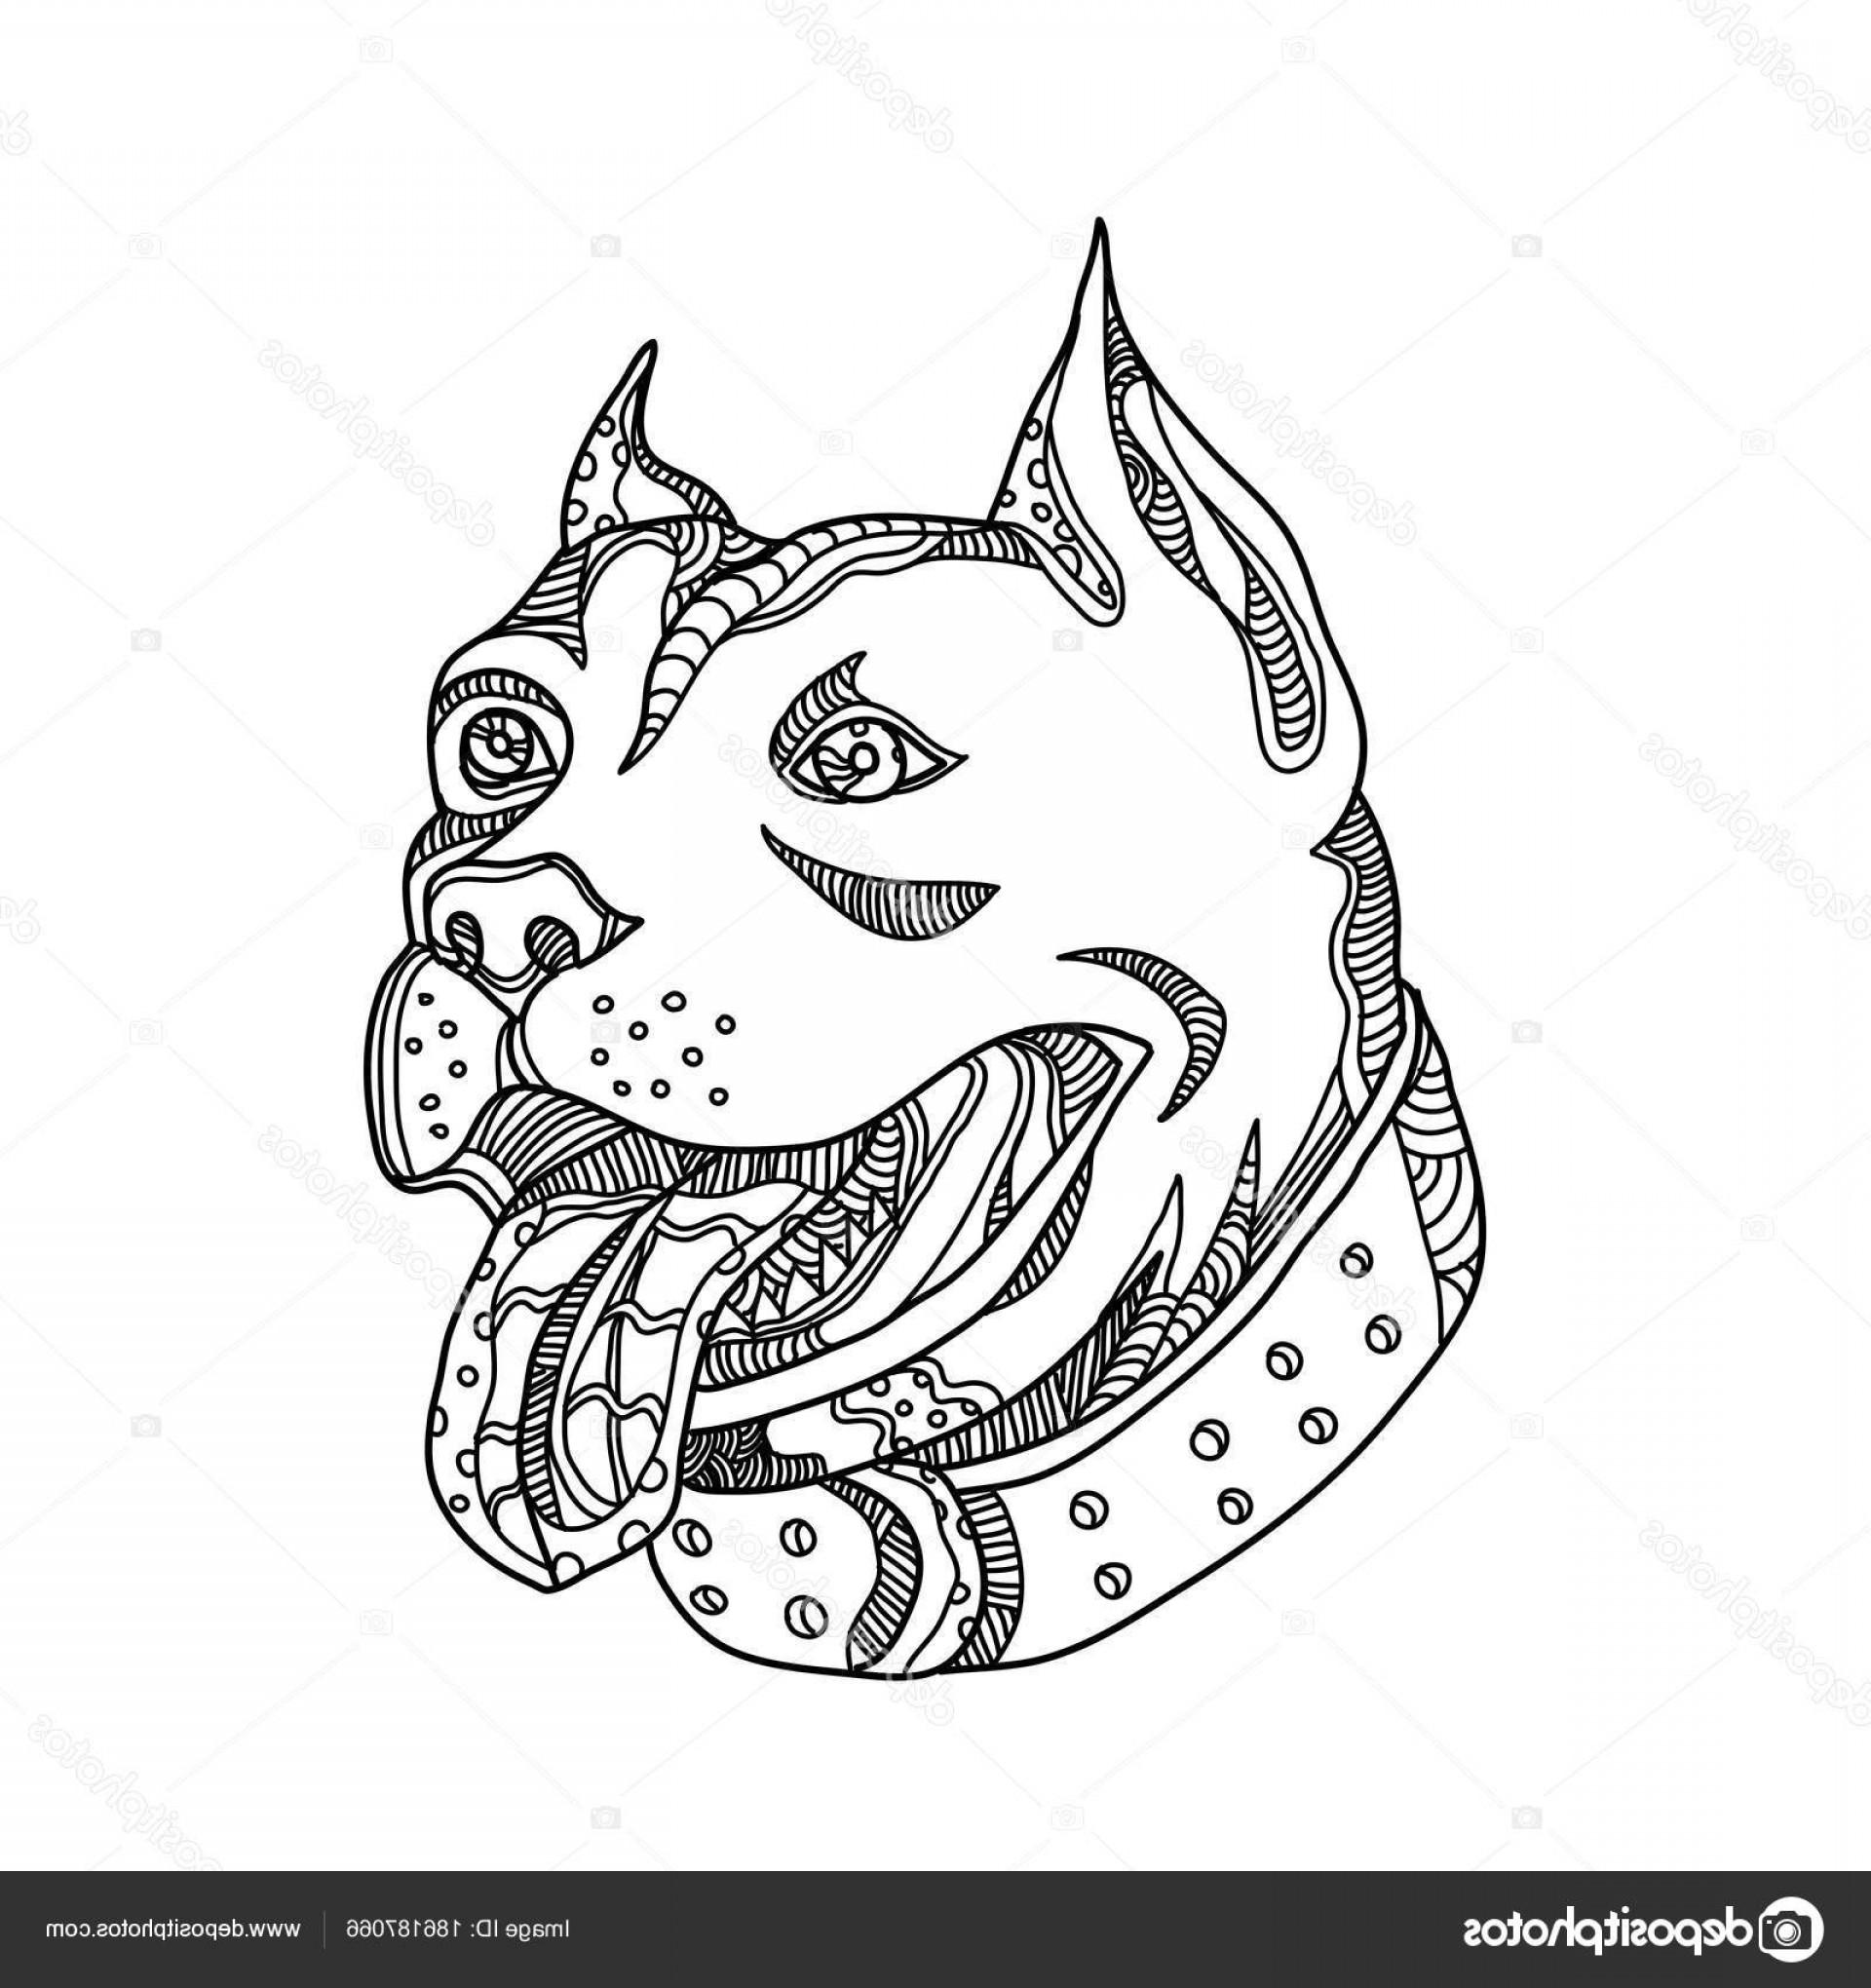 1920x2040 Stock Illustration Pit Bull Head Doodle Art Shopatcloth